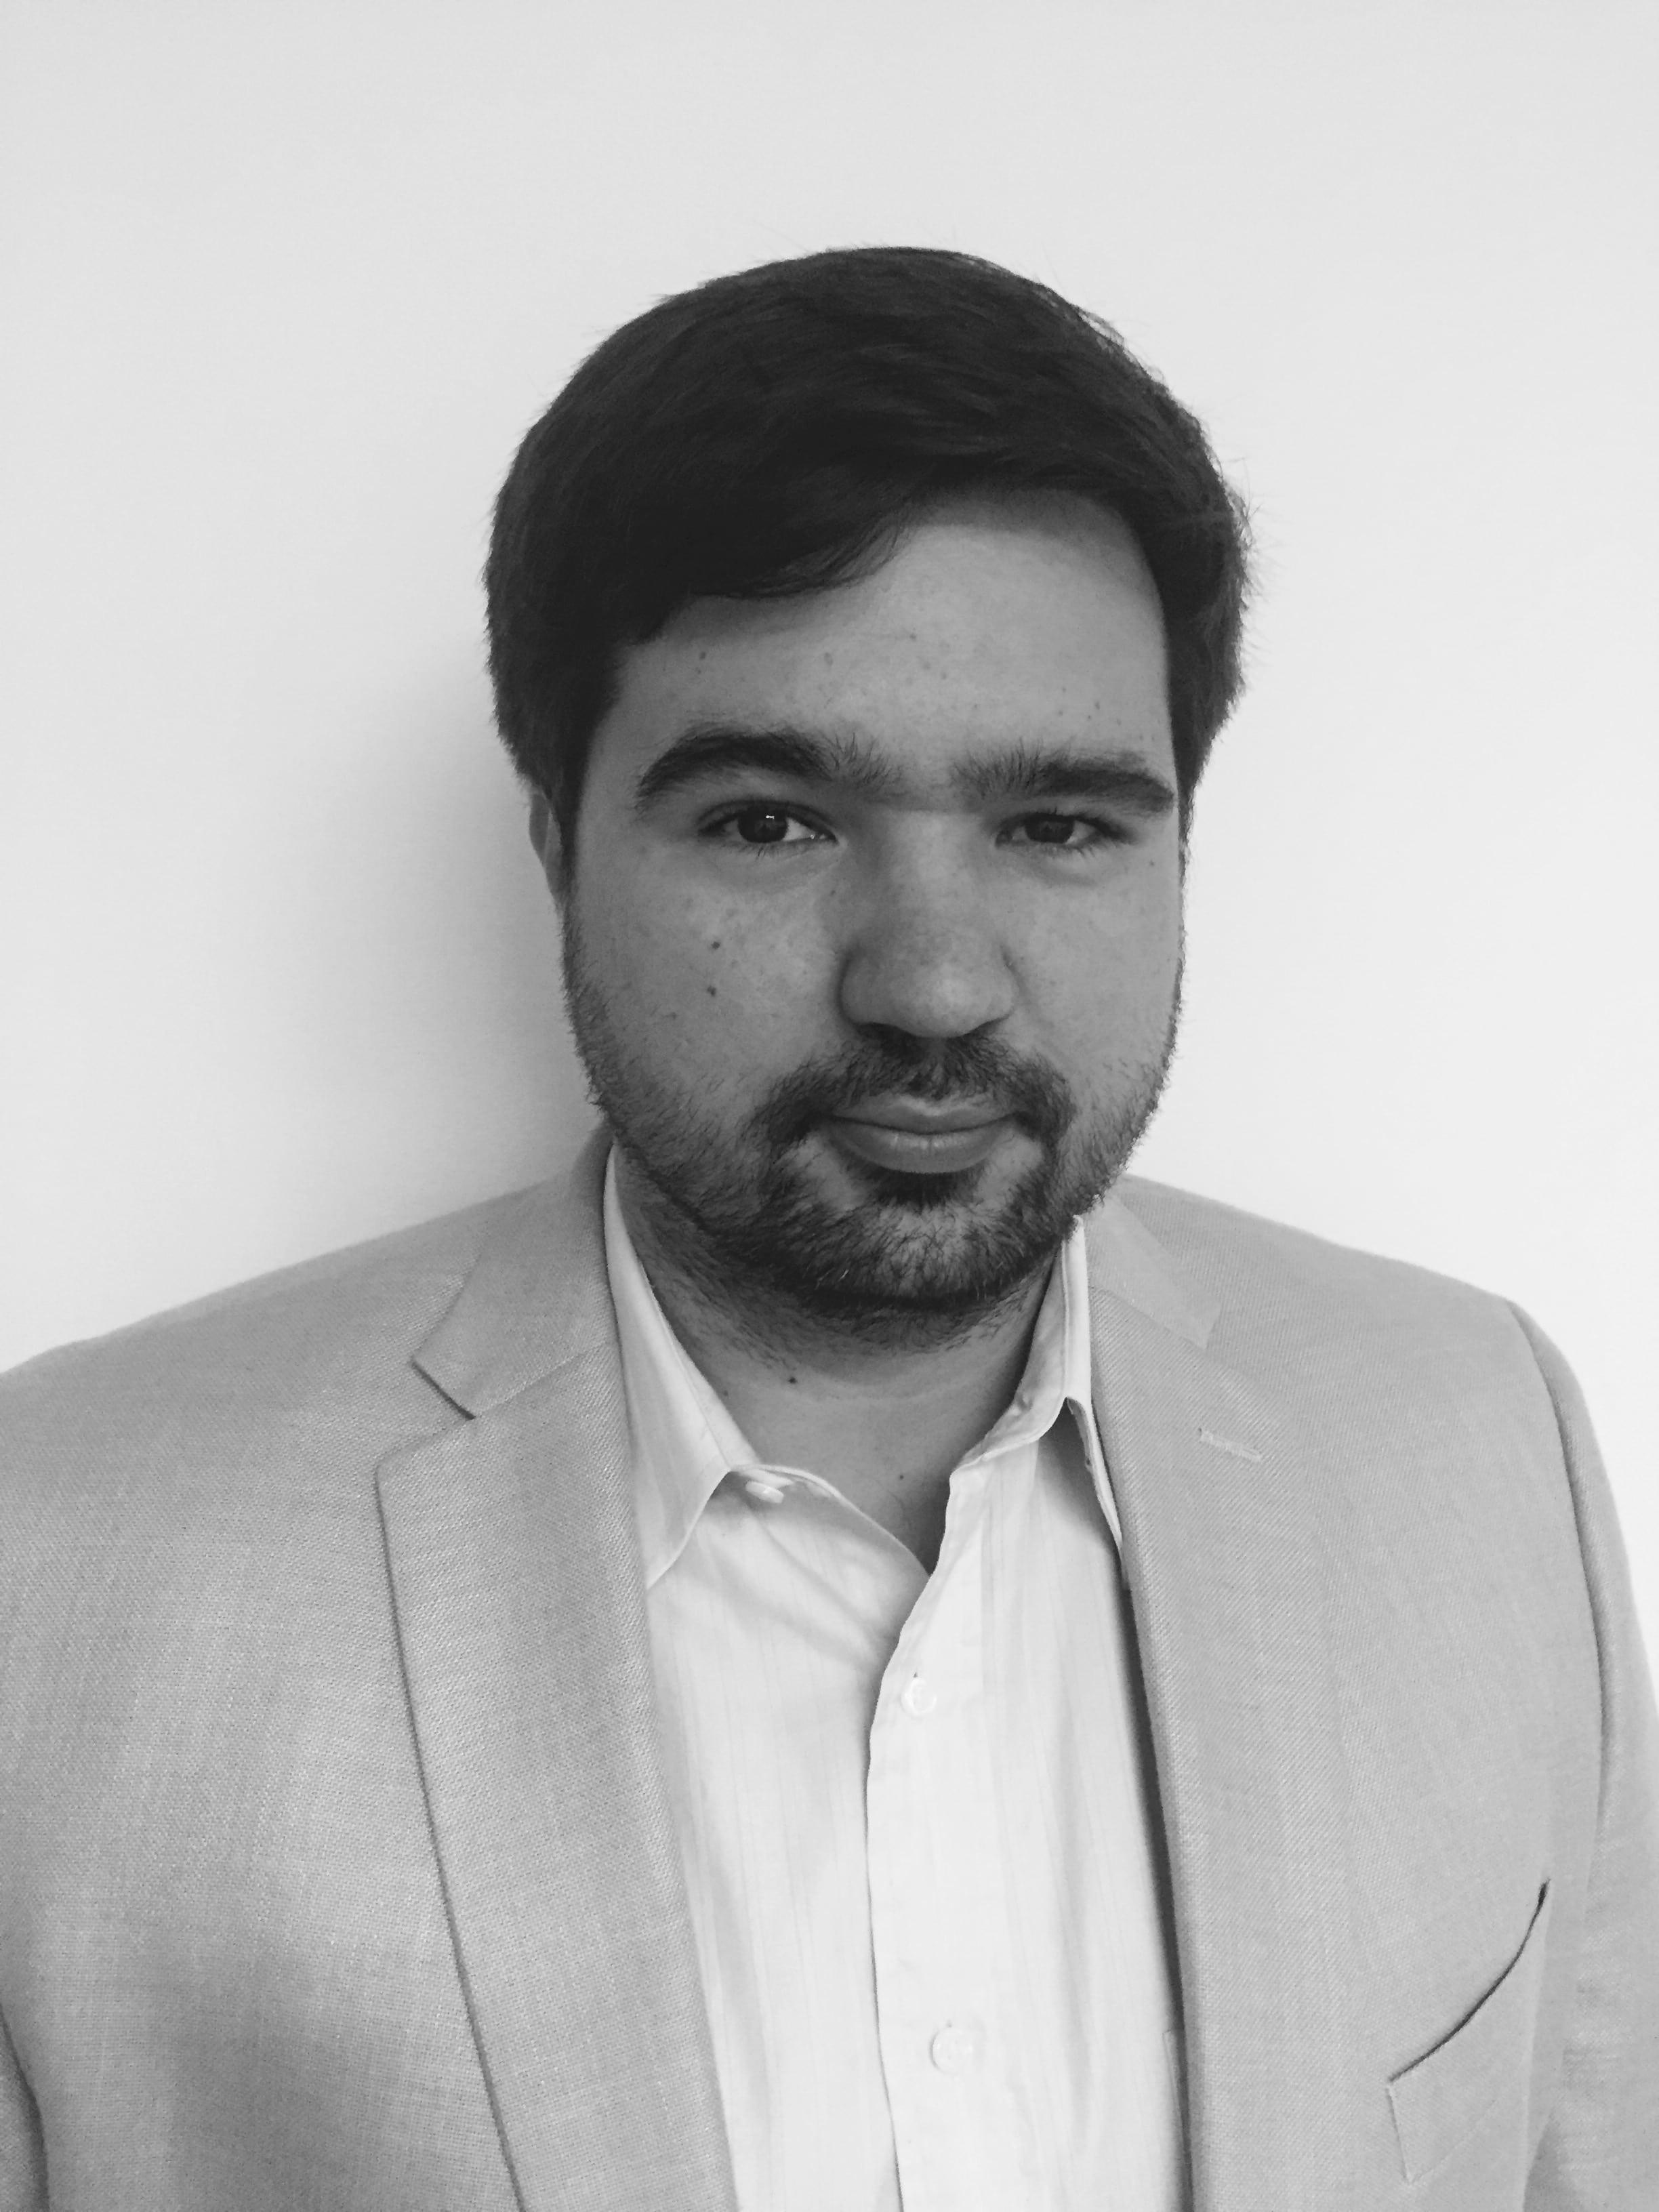 Renan Aniceto